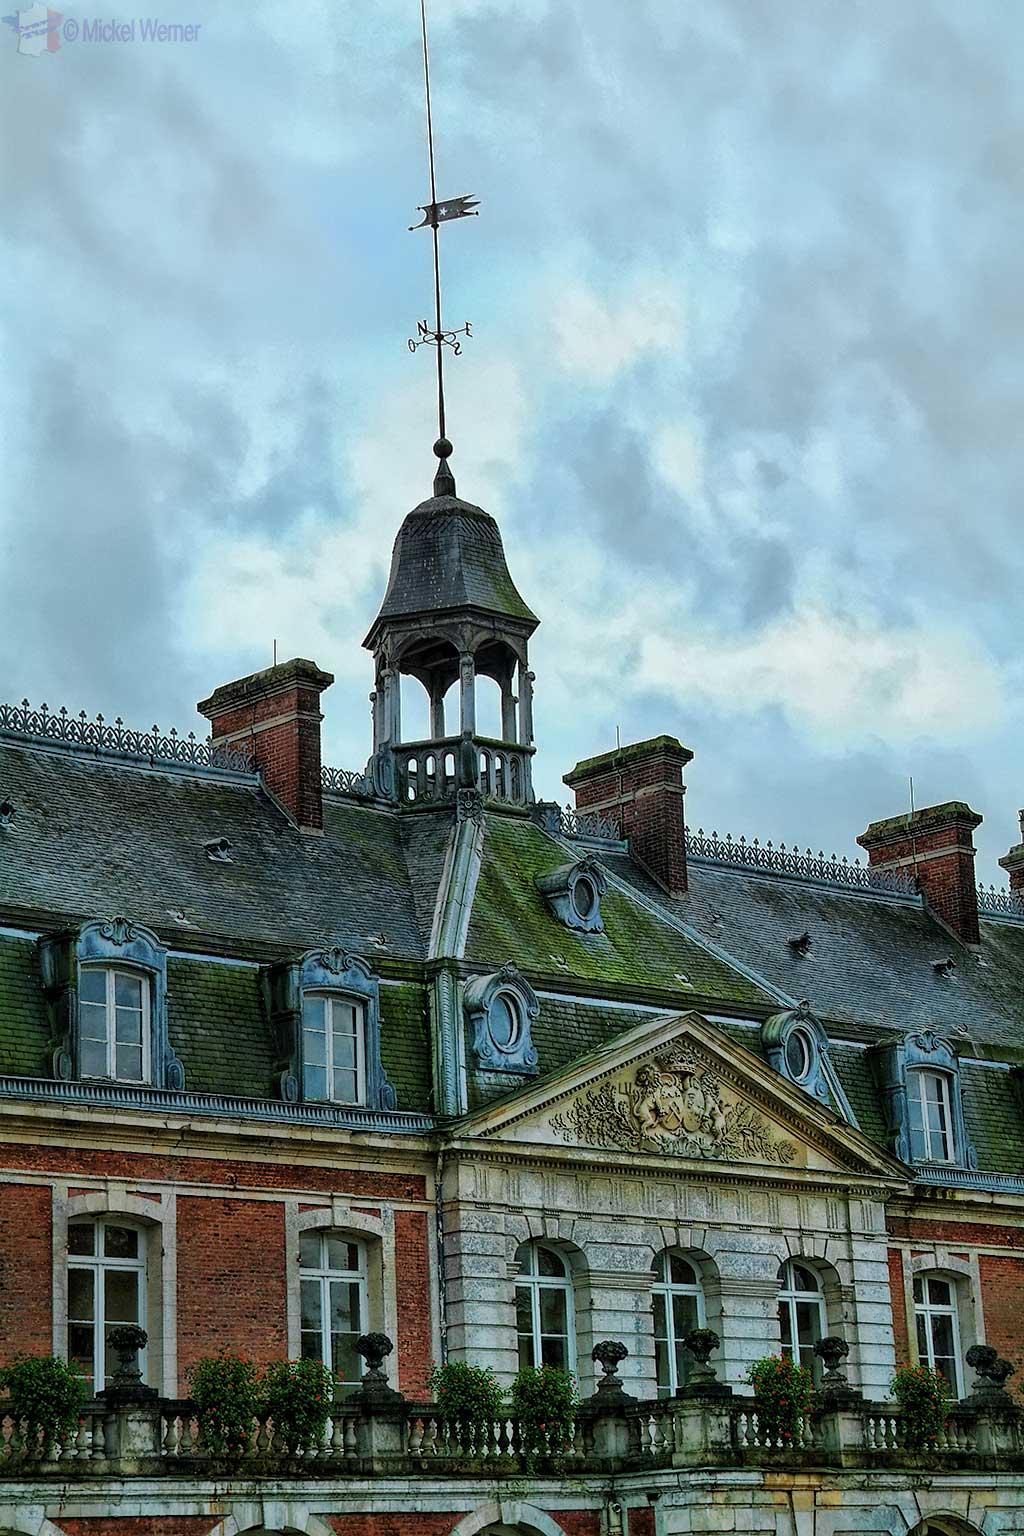 Steeple of the Chateau de Villequier at Villequier